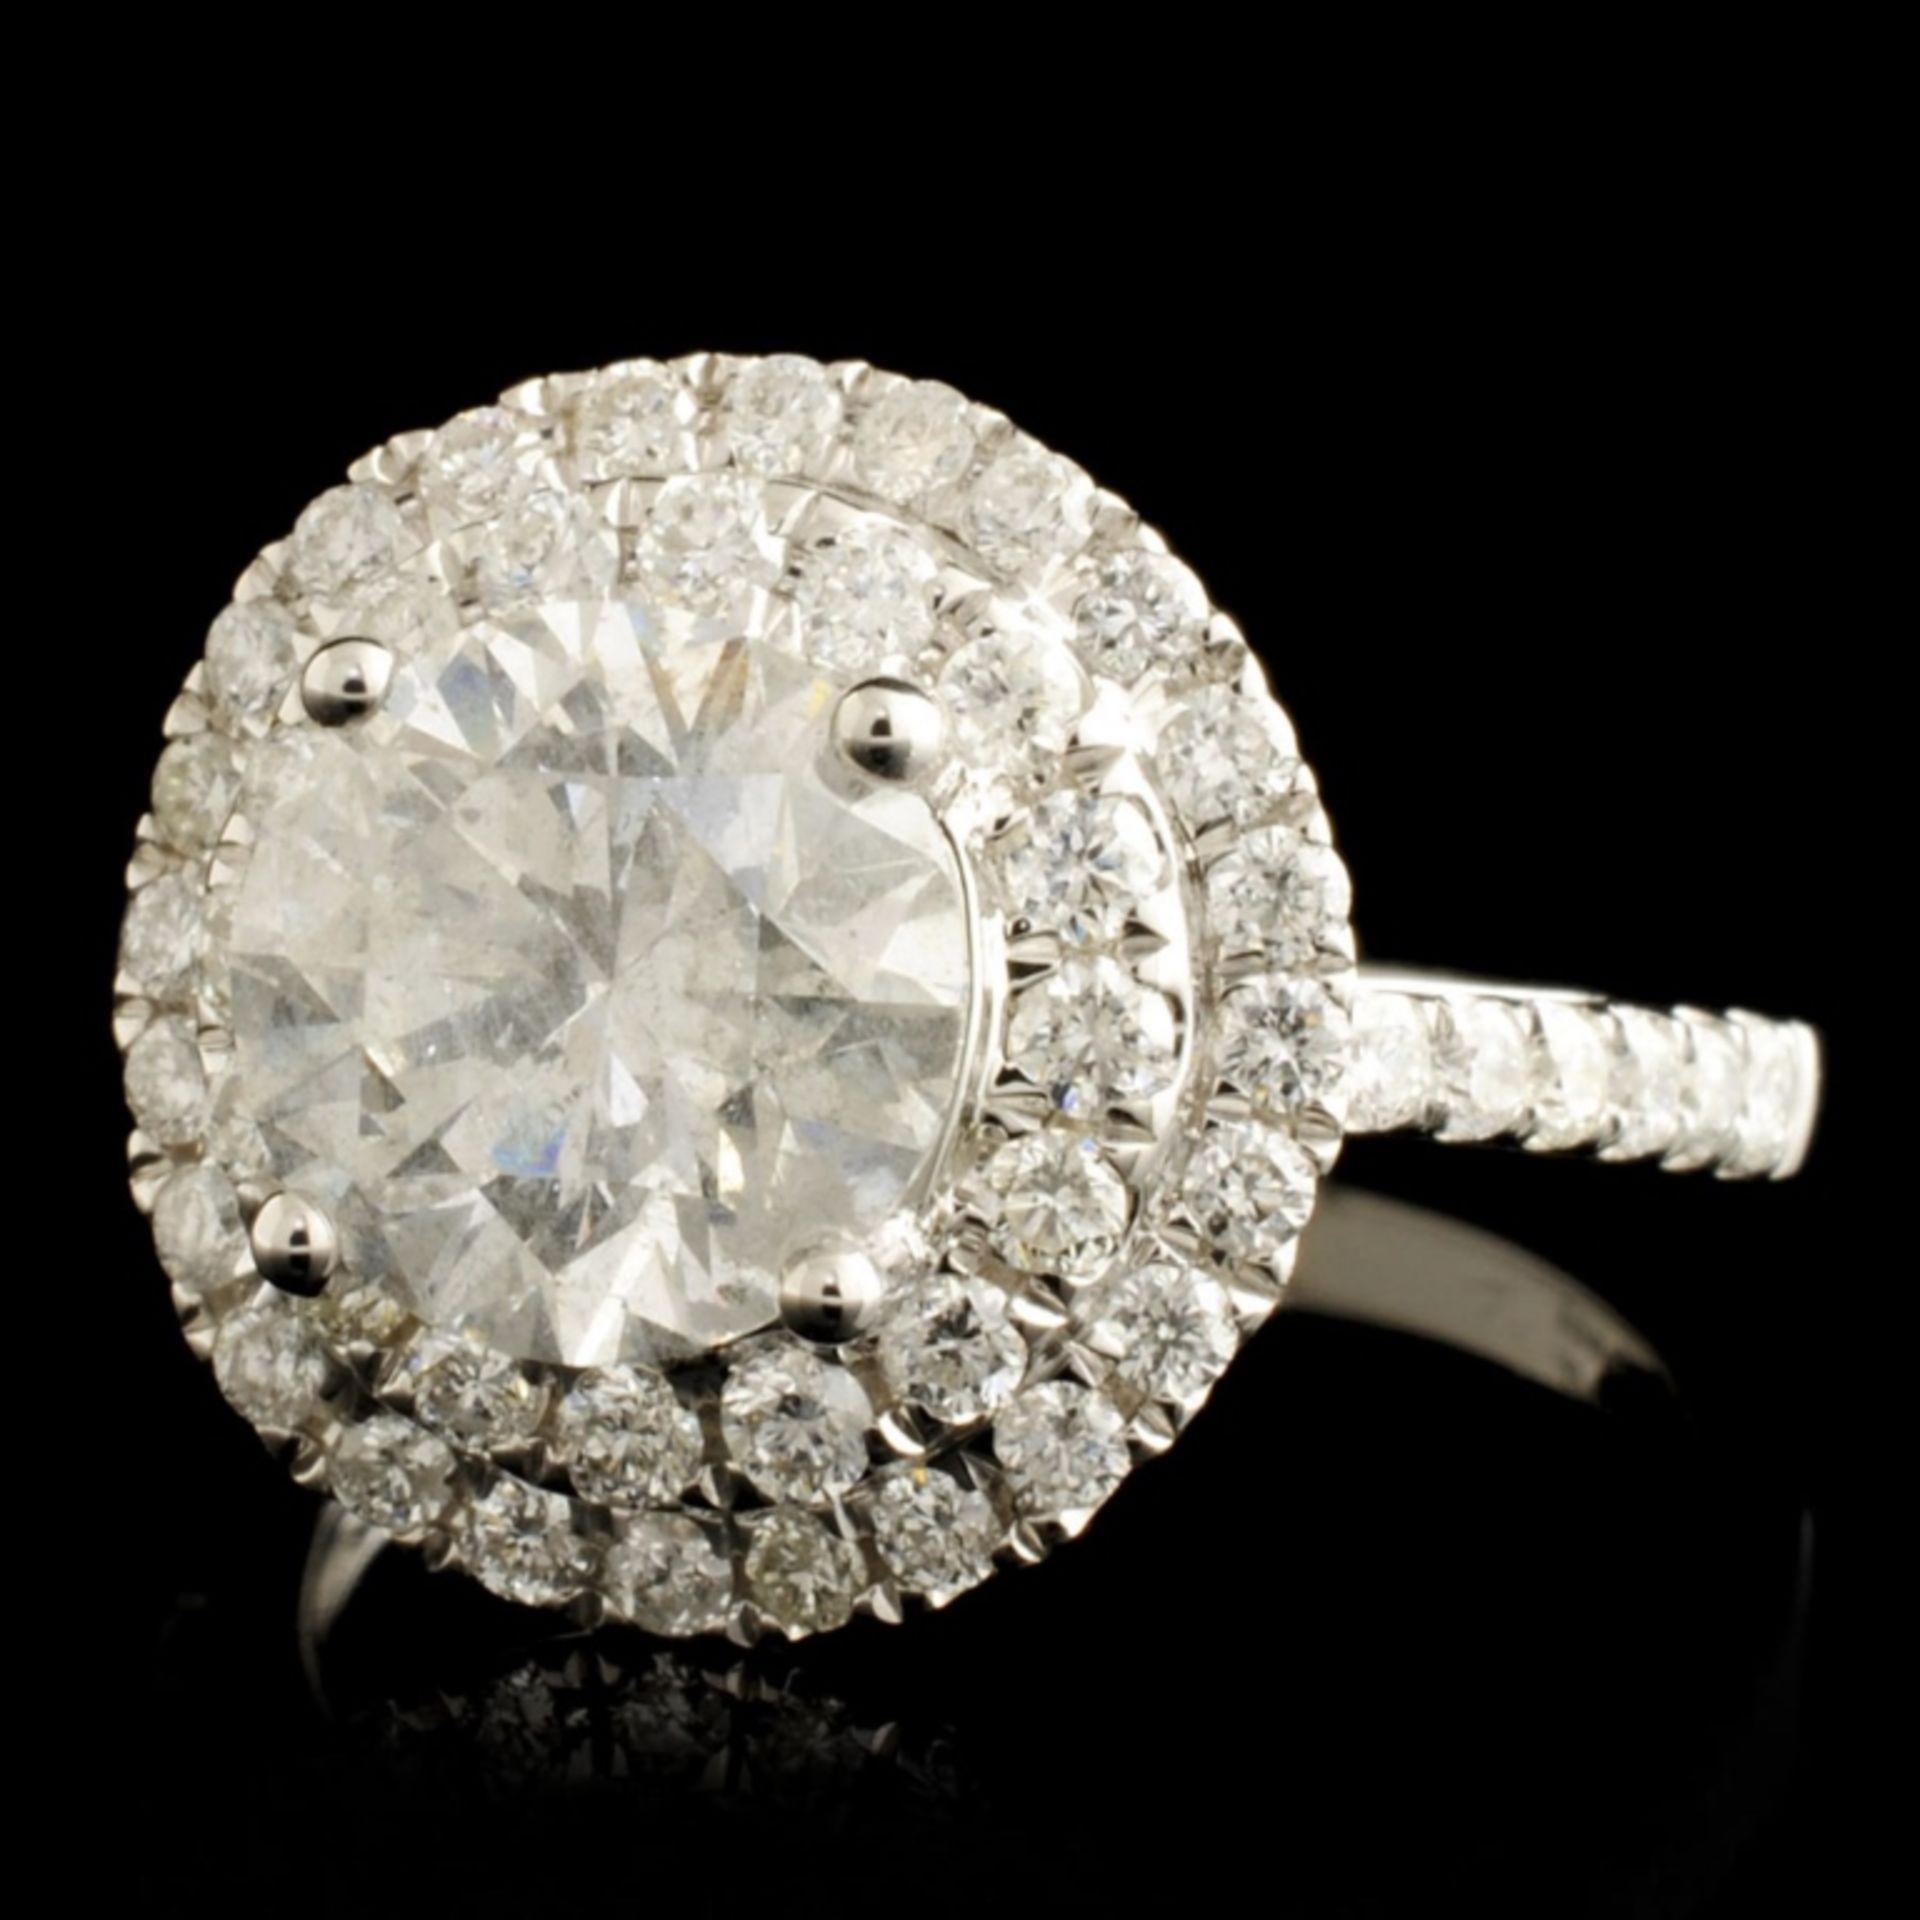 18K Gold 2.73ctw Diamond Ring - Image 2 of 7